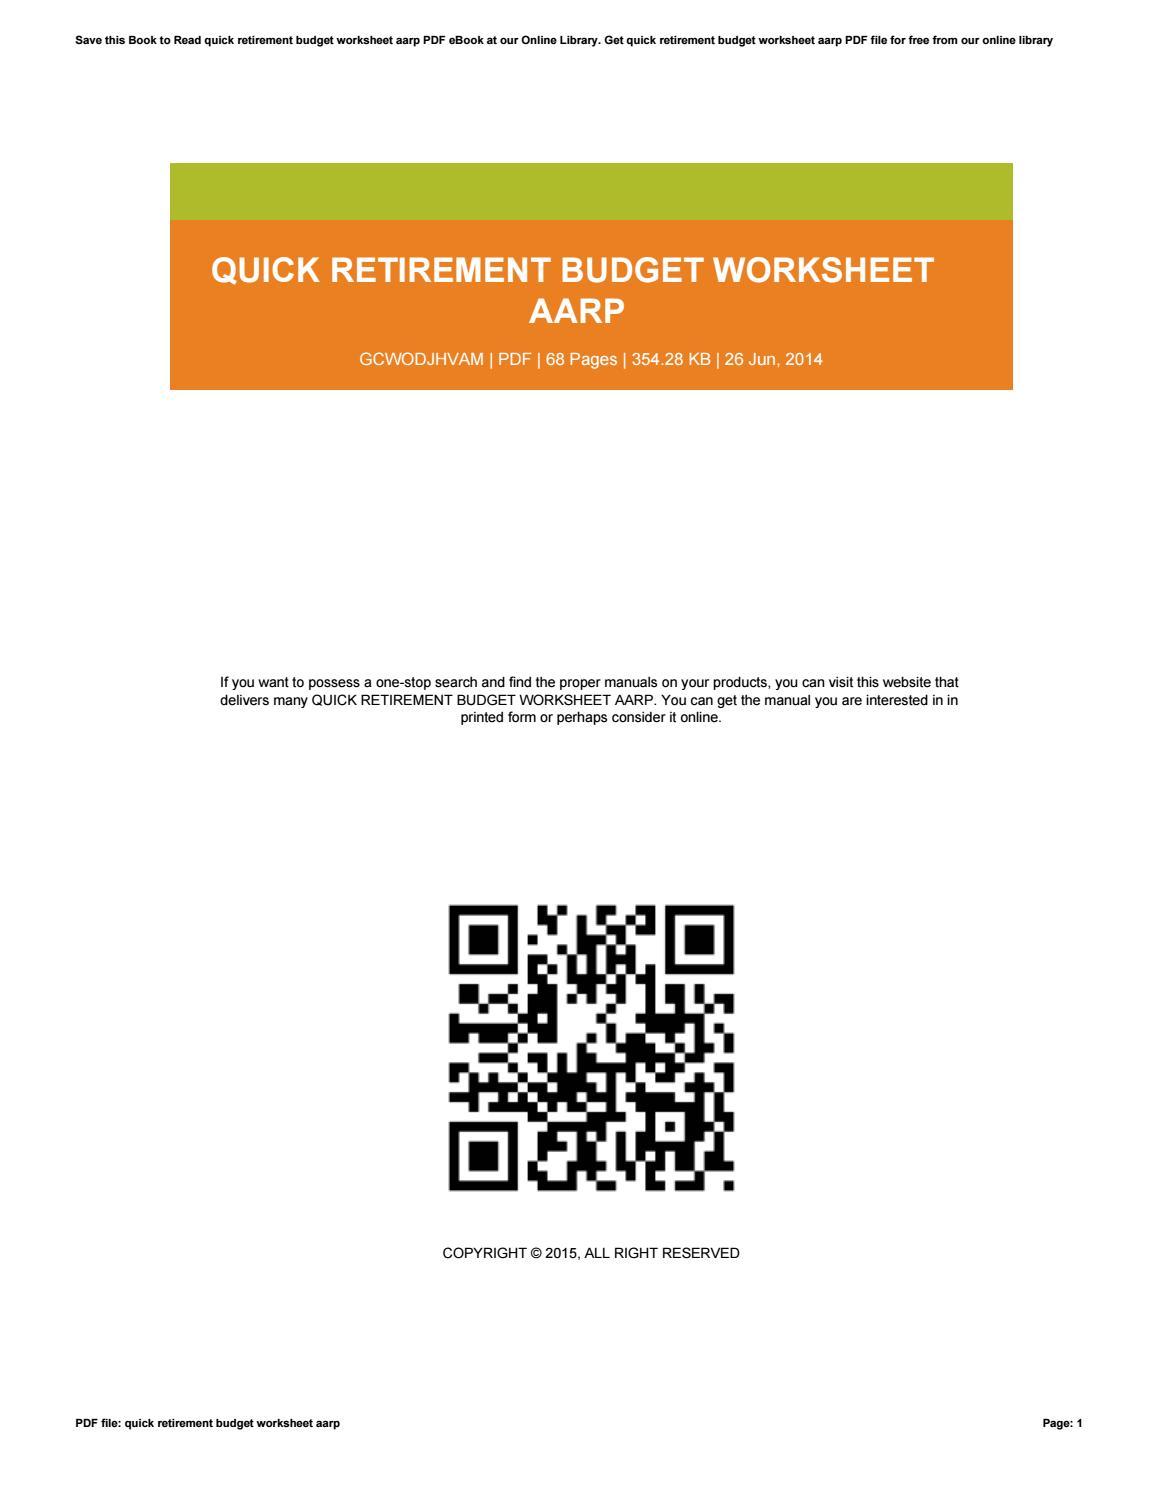 Quick Retirement Budget Worksheet Aarp By Laurelsipes4449 Issuu